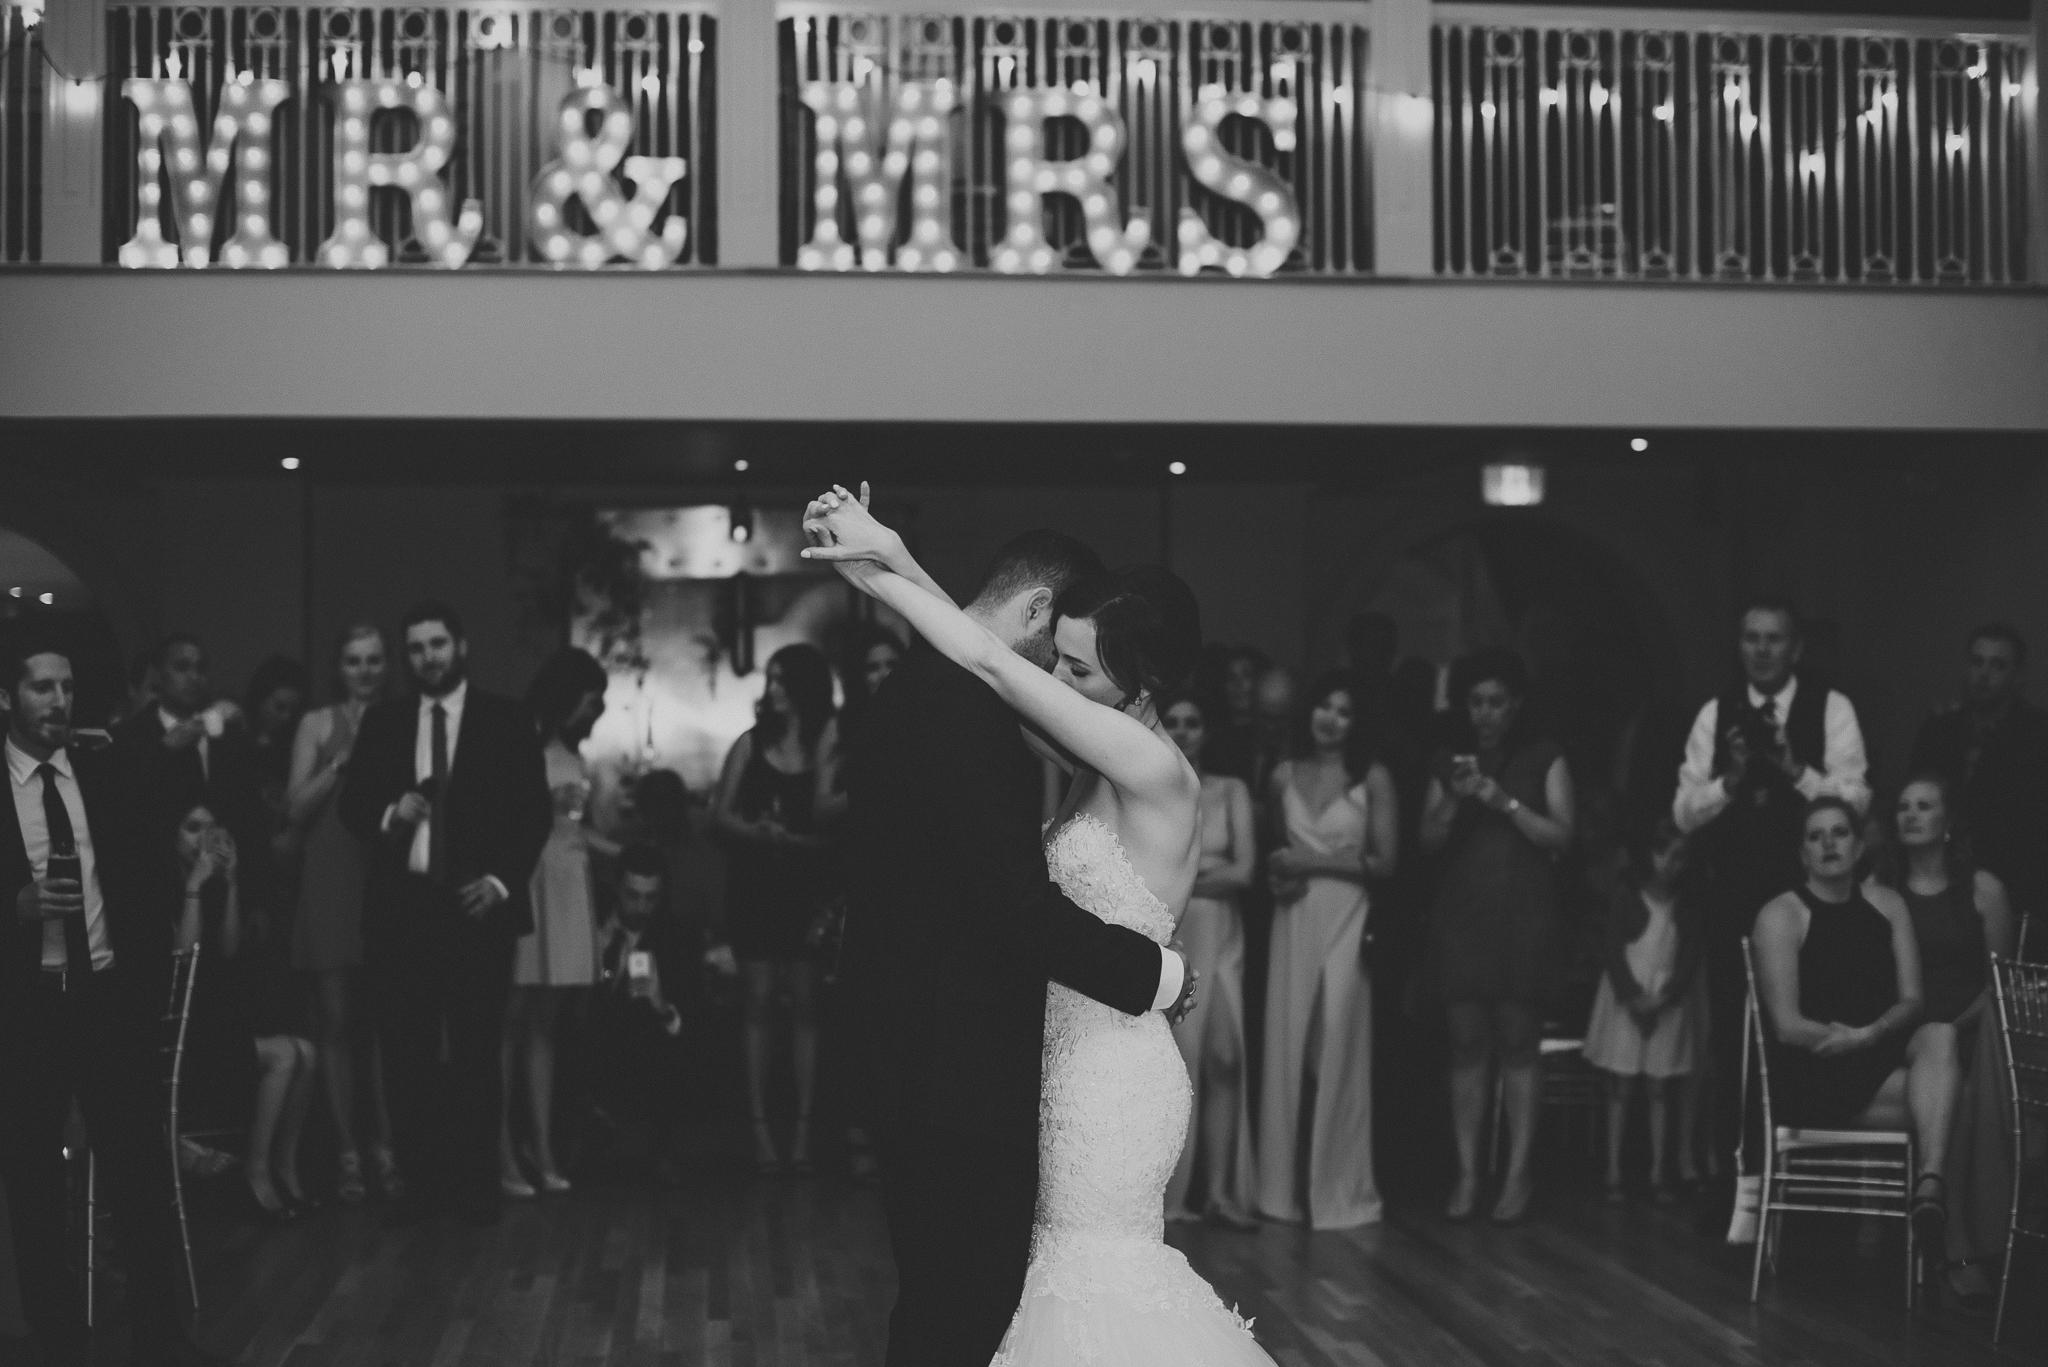 239-permanent-vancouver-wedding-courtneysteven-web-9496.jpg